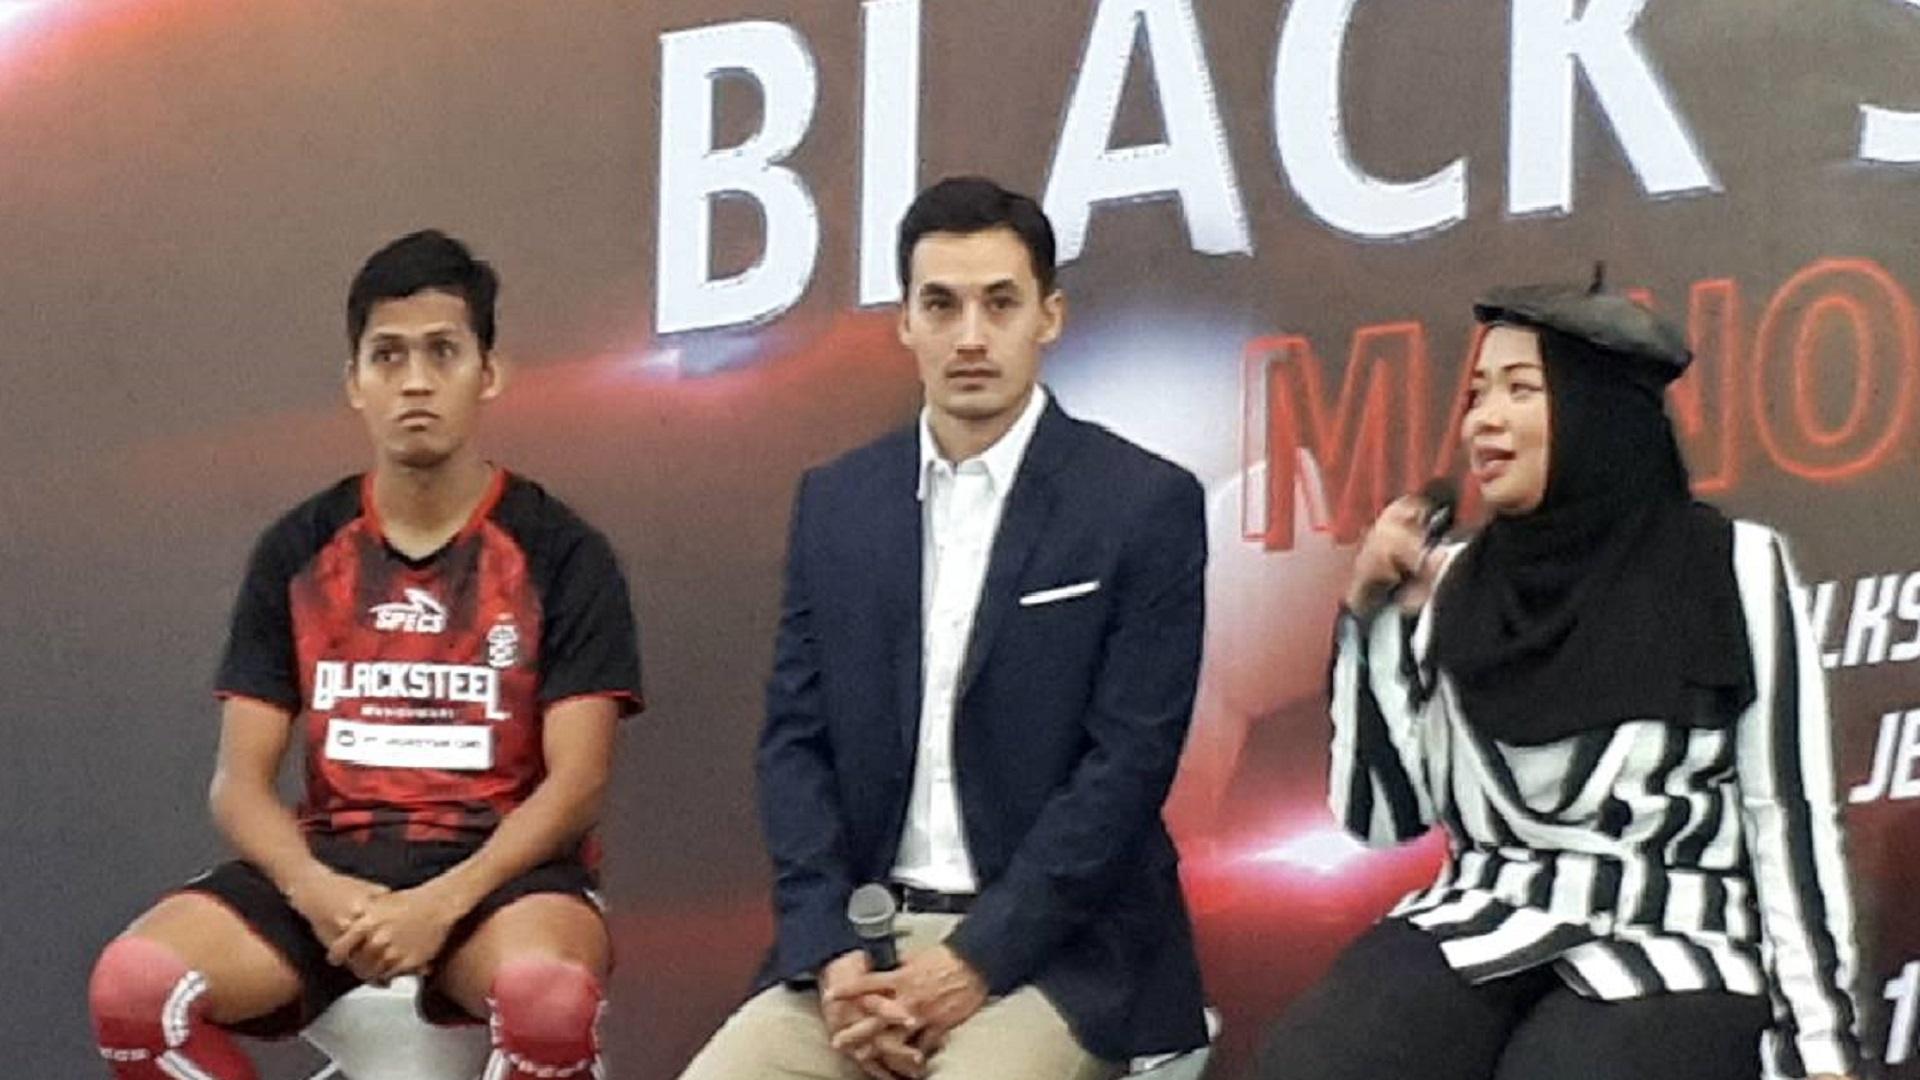 Black Steel Manokwari FC - Yori van der Torren